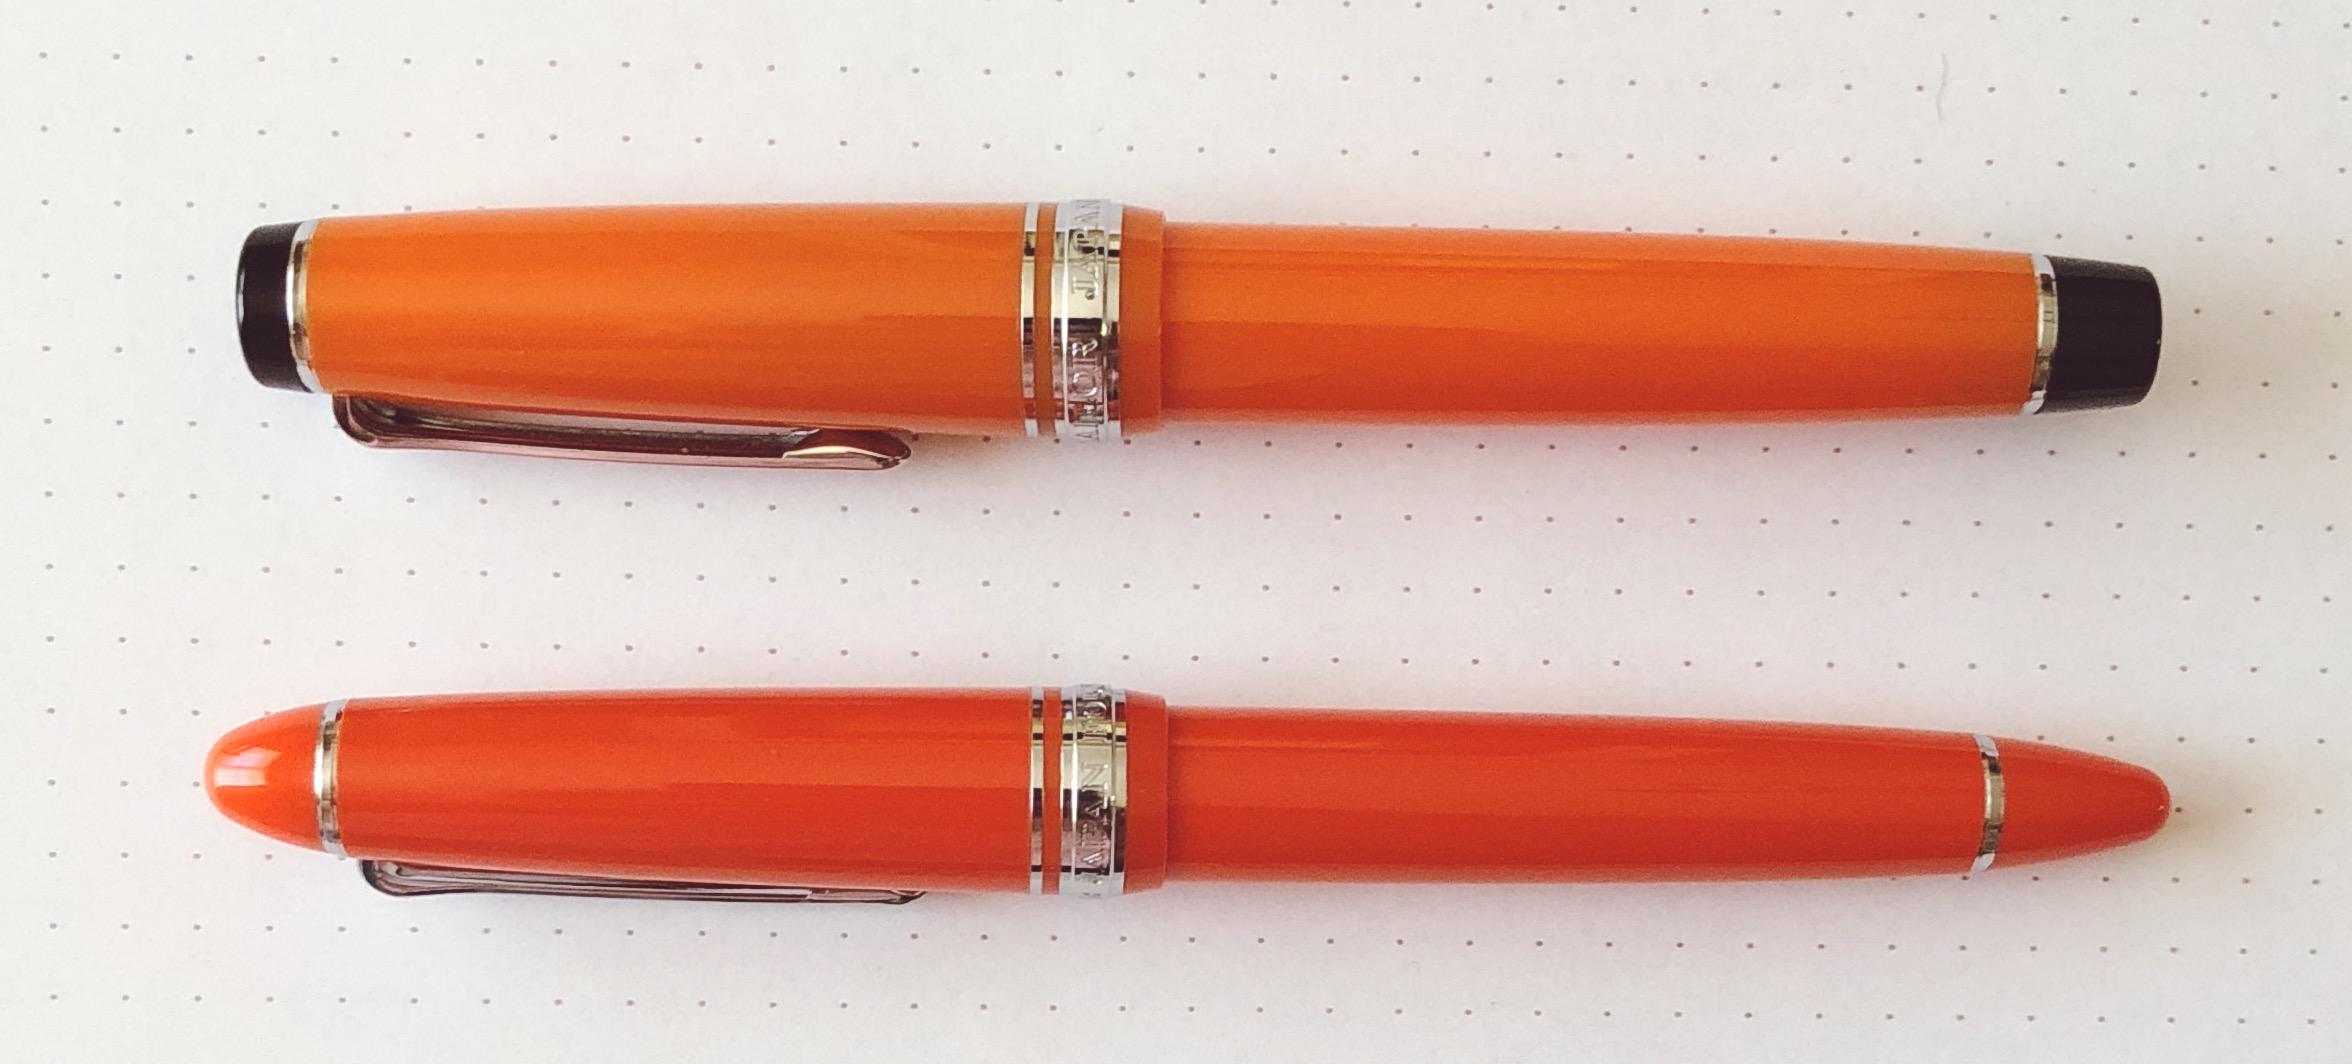 Pro Gear Orange (top) vs 1911 Standard Royal Tangerine